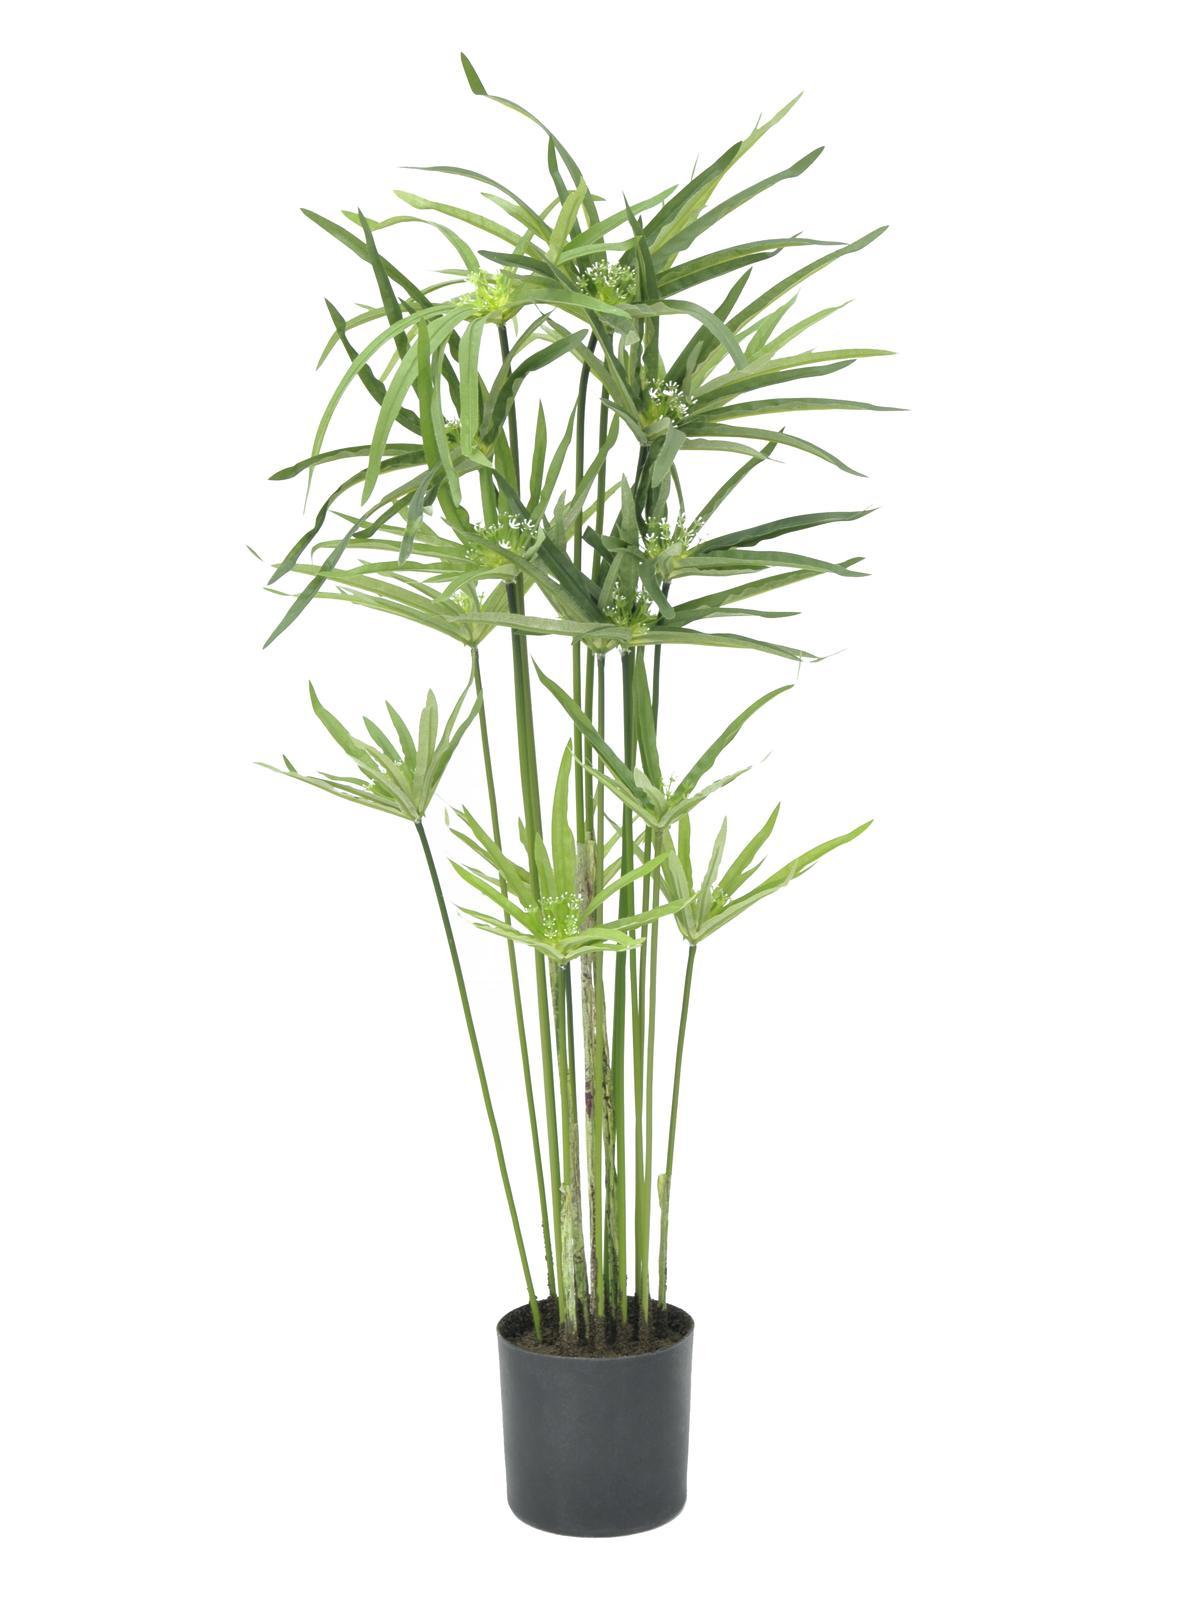 Plant Artificial Grass Cyprus 76 CM Europalms